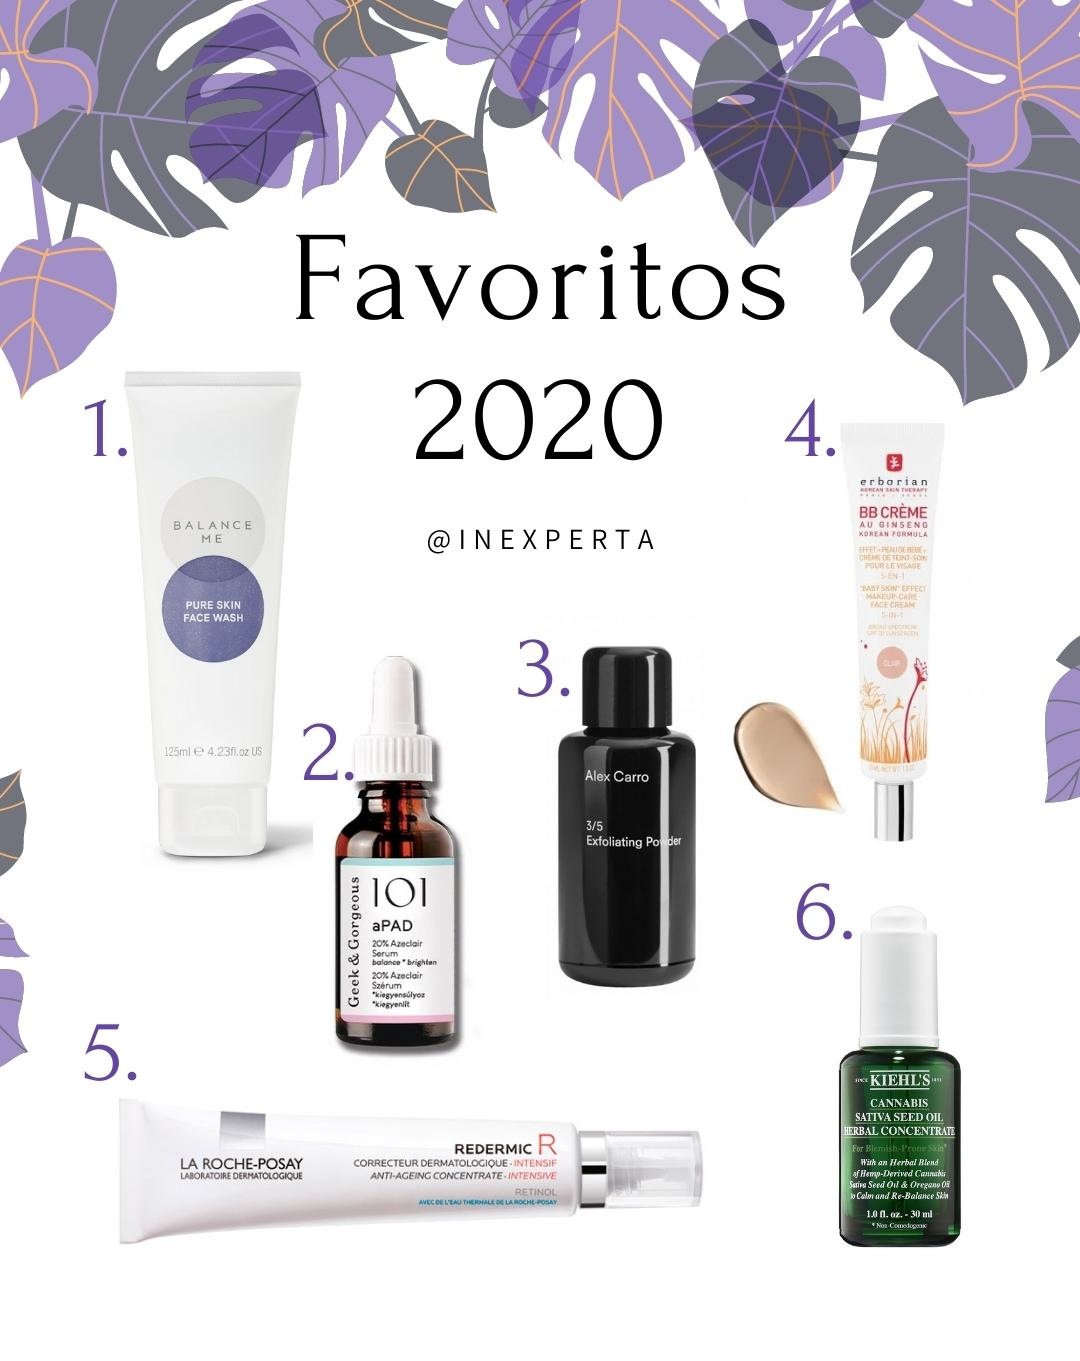 Productos favoritos skincare cuidado facial 2020 inexperta